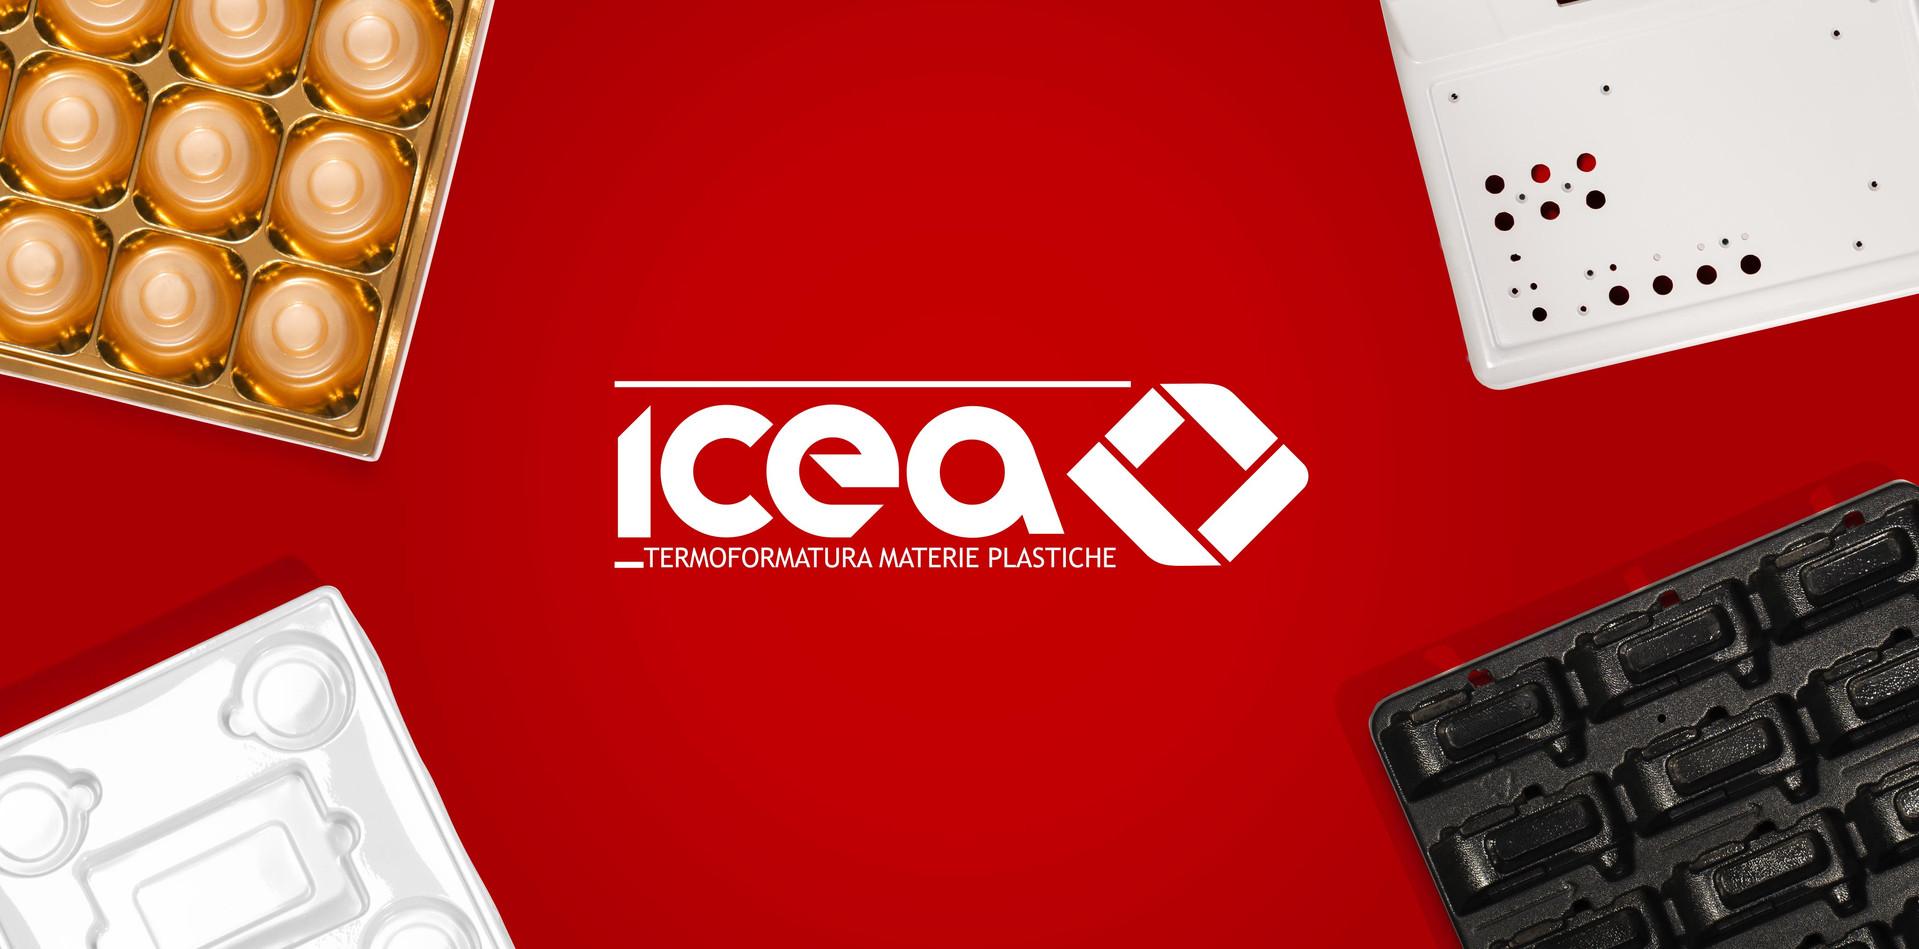 icea_rosso_anteprima.jpg